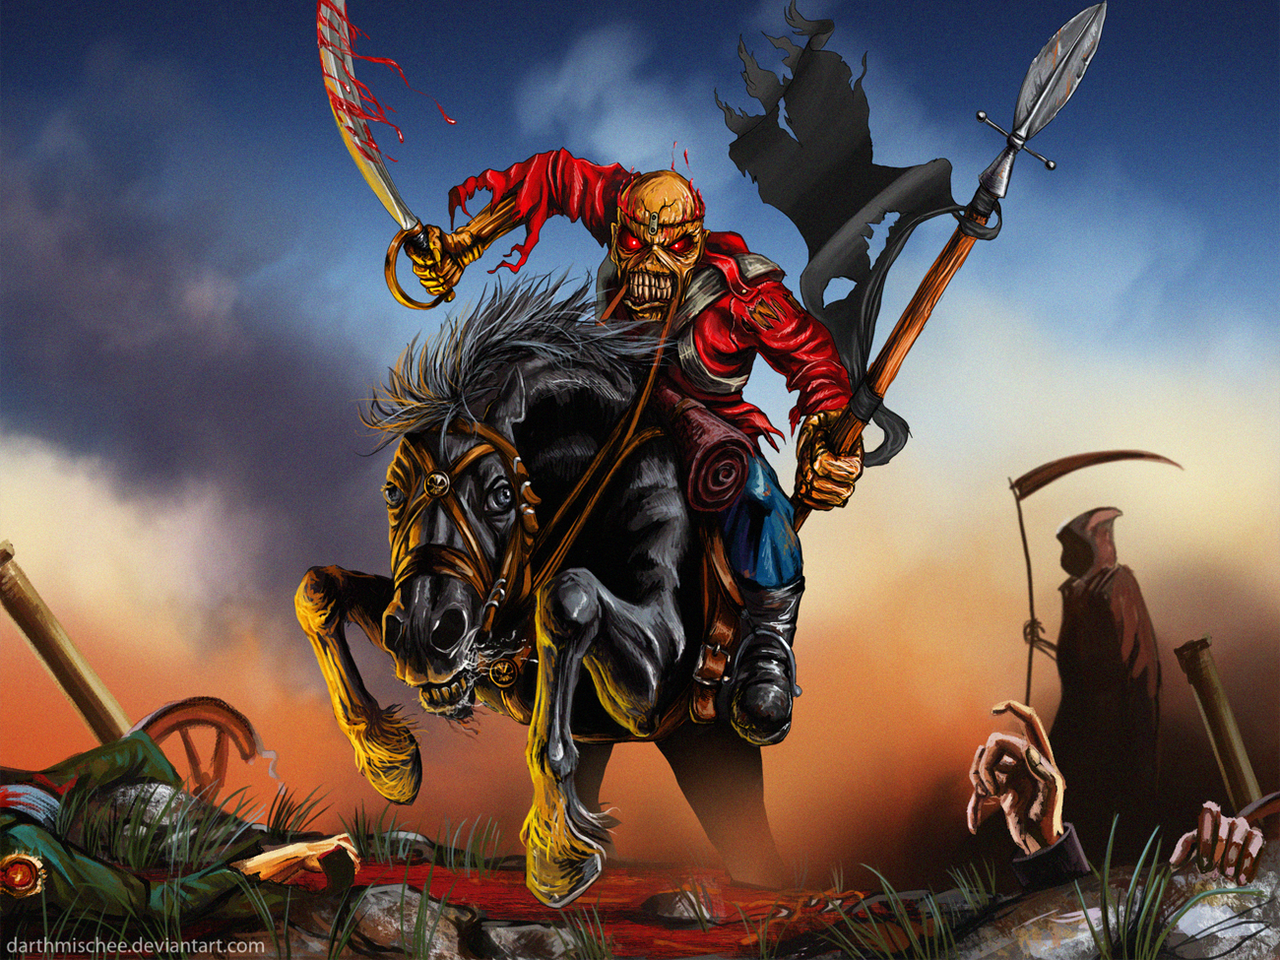 Iron Maiden Eddie With Video By Whiluna On Deviantart Iron Maiden Eddie Iron Maiden Posters Iron Maiden The Trooper